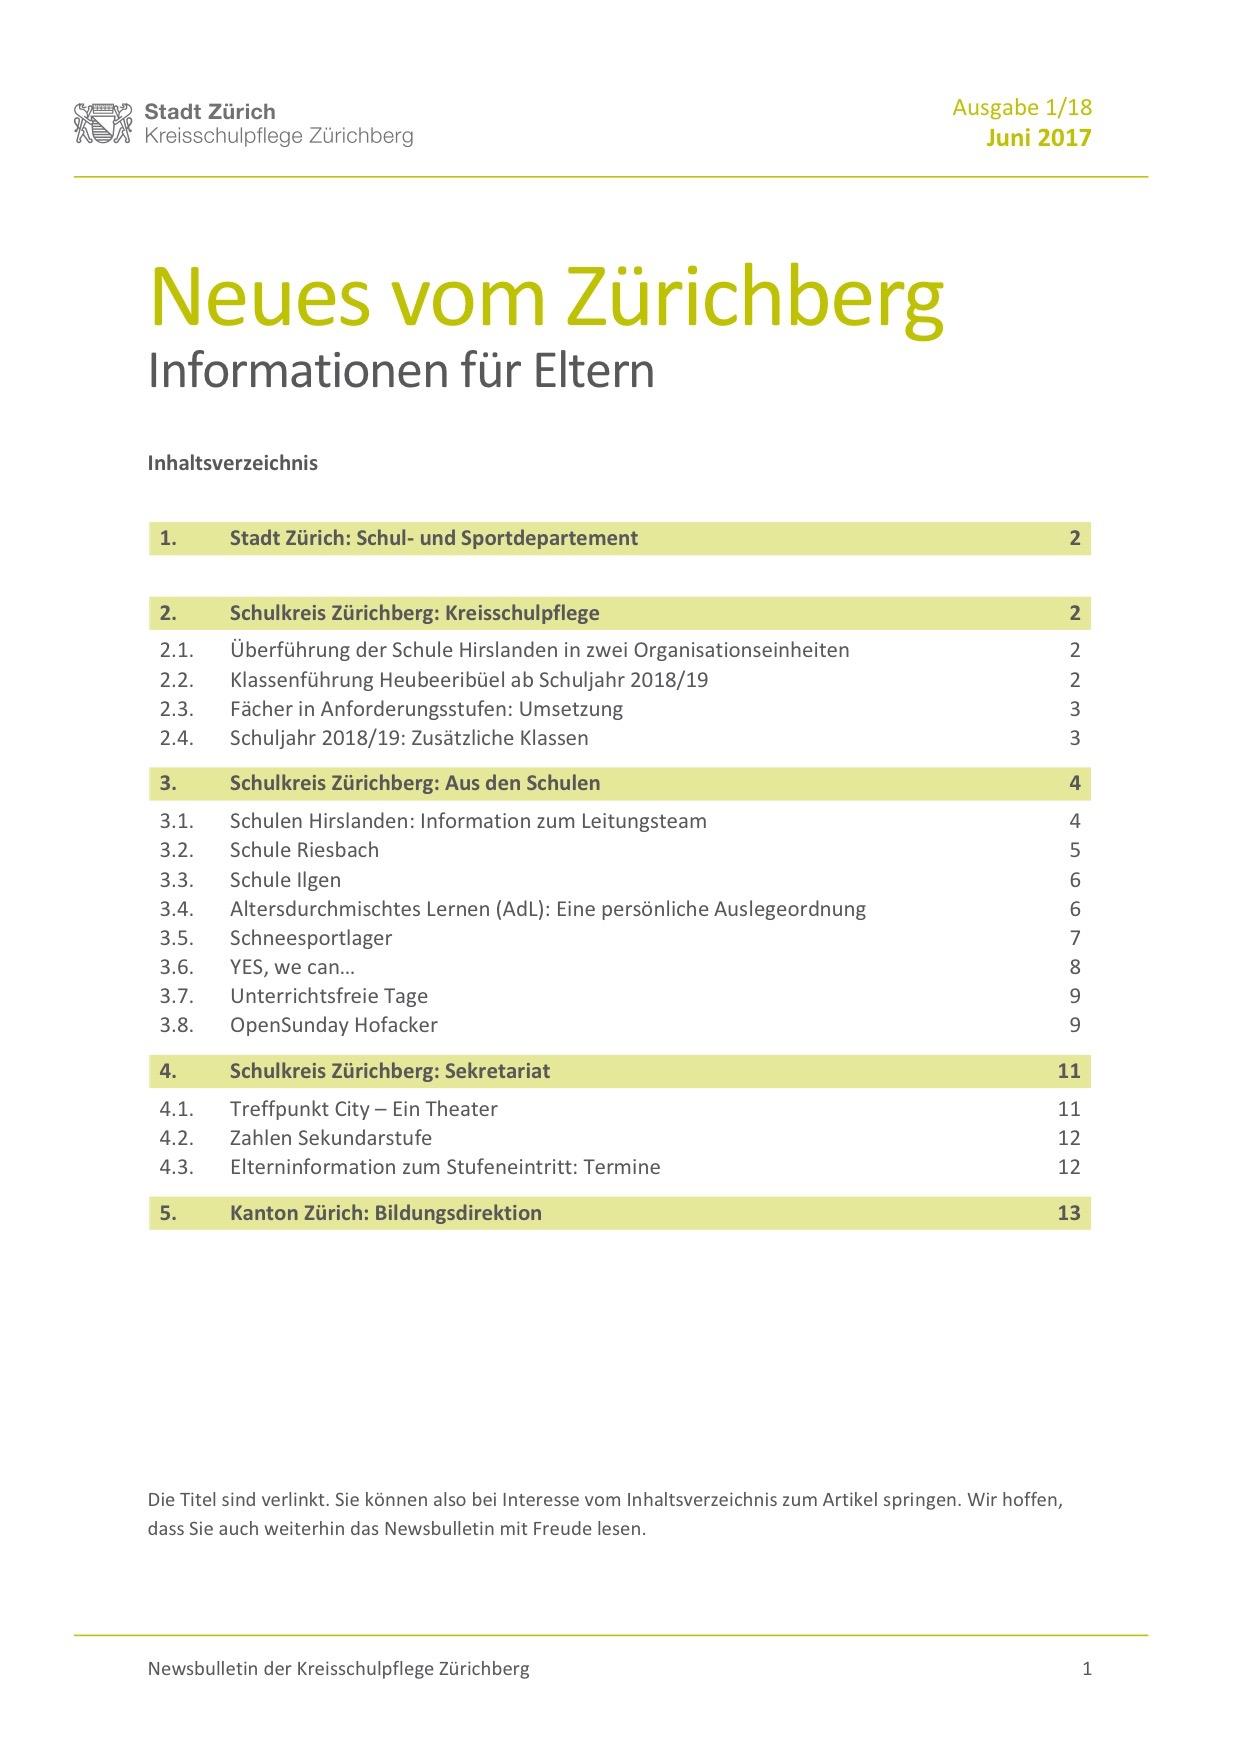 18_Neues_v_Zuerichberg_EOZ_1 (verschoben).jpg